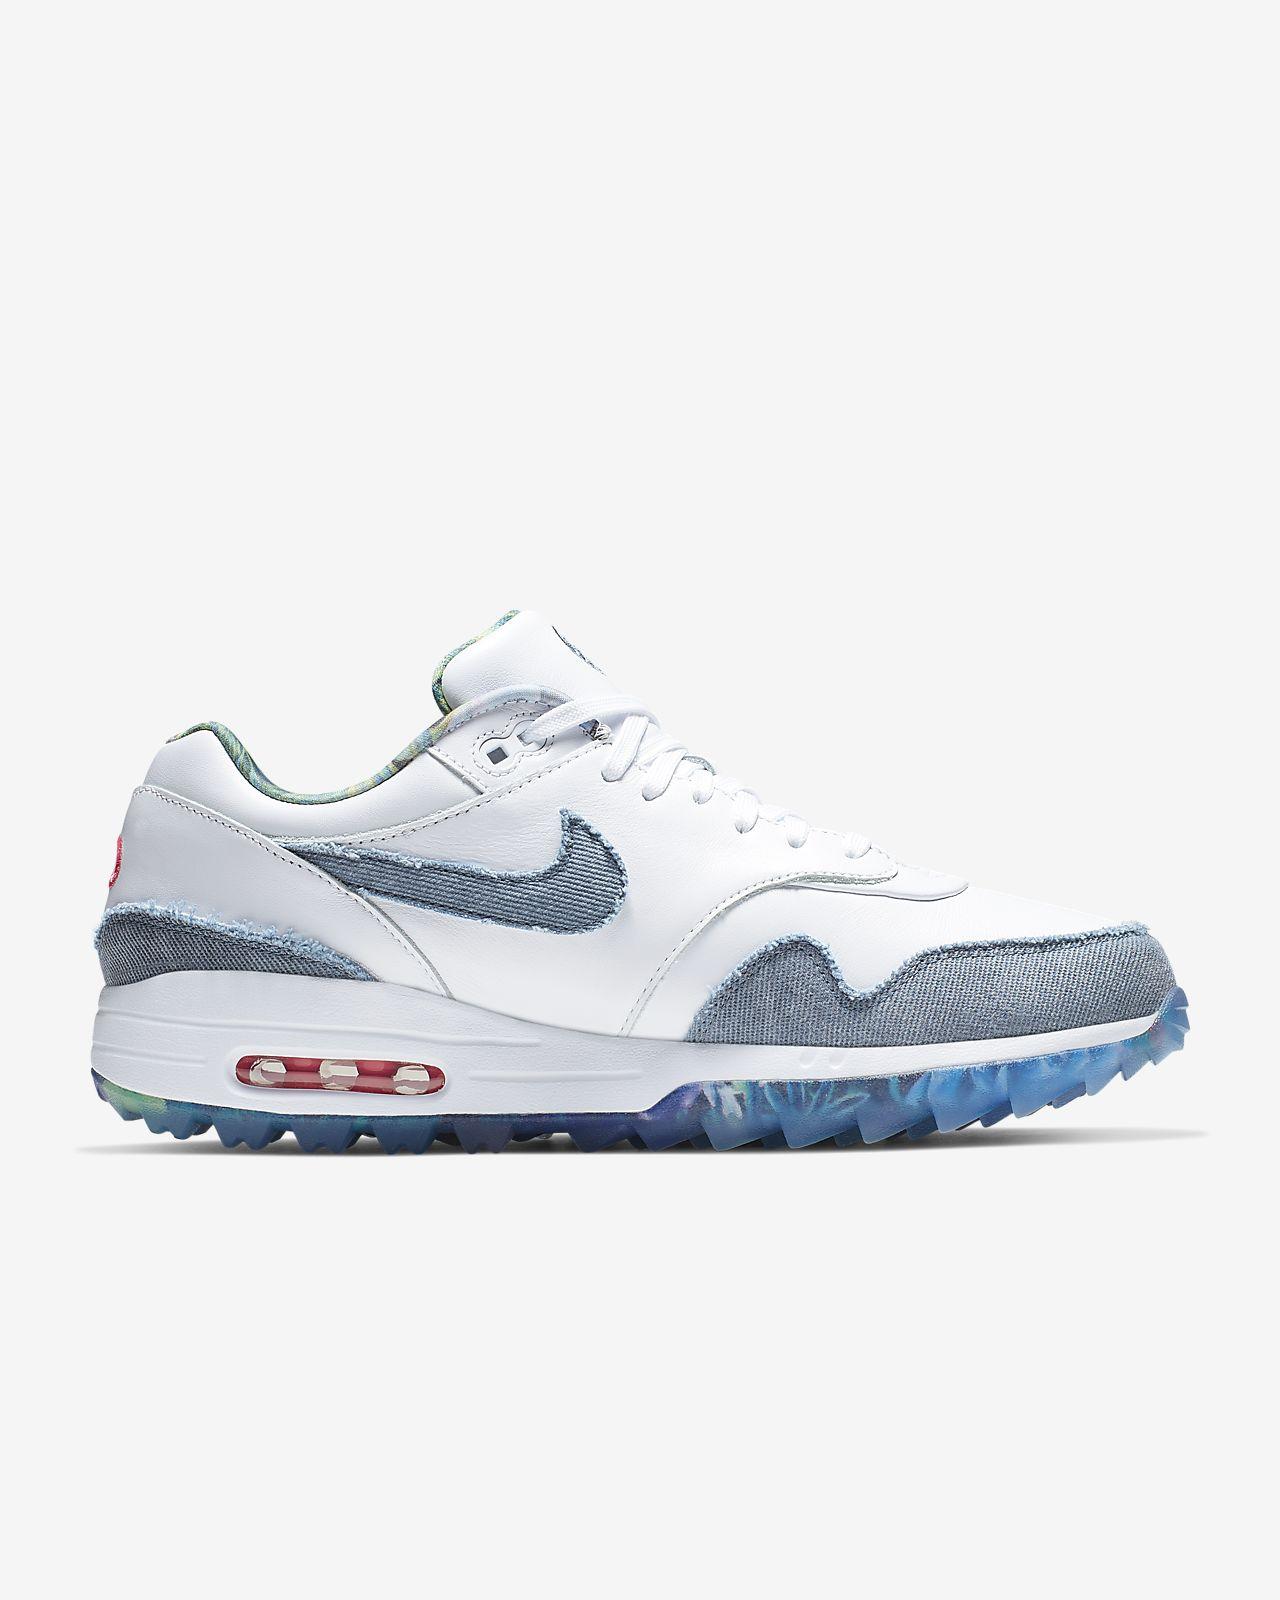 Nike Air Max 1G NRG Men's Golf Shoe